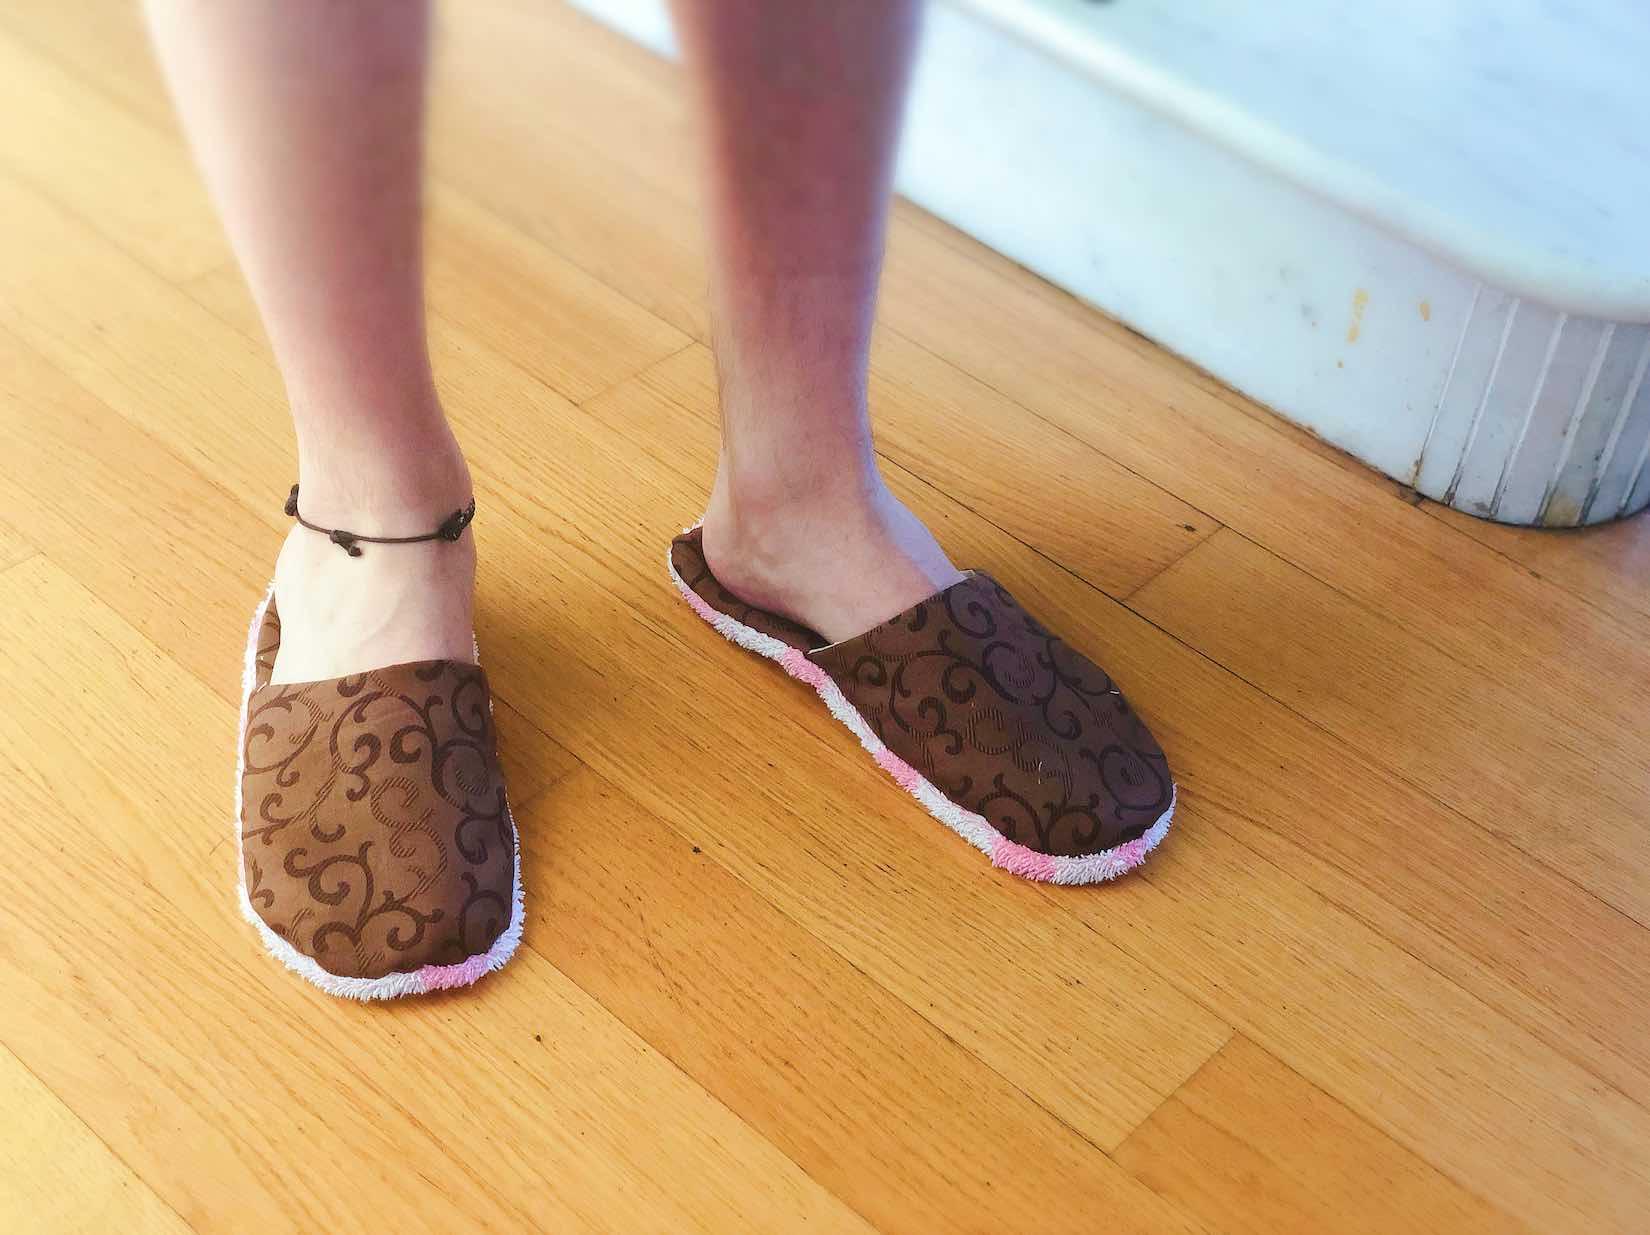 pantofole indossate da riccardo